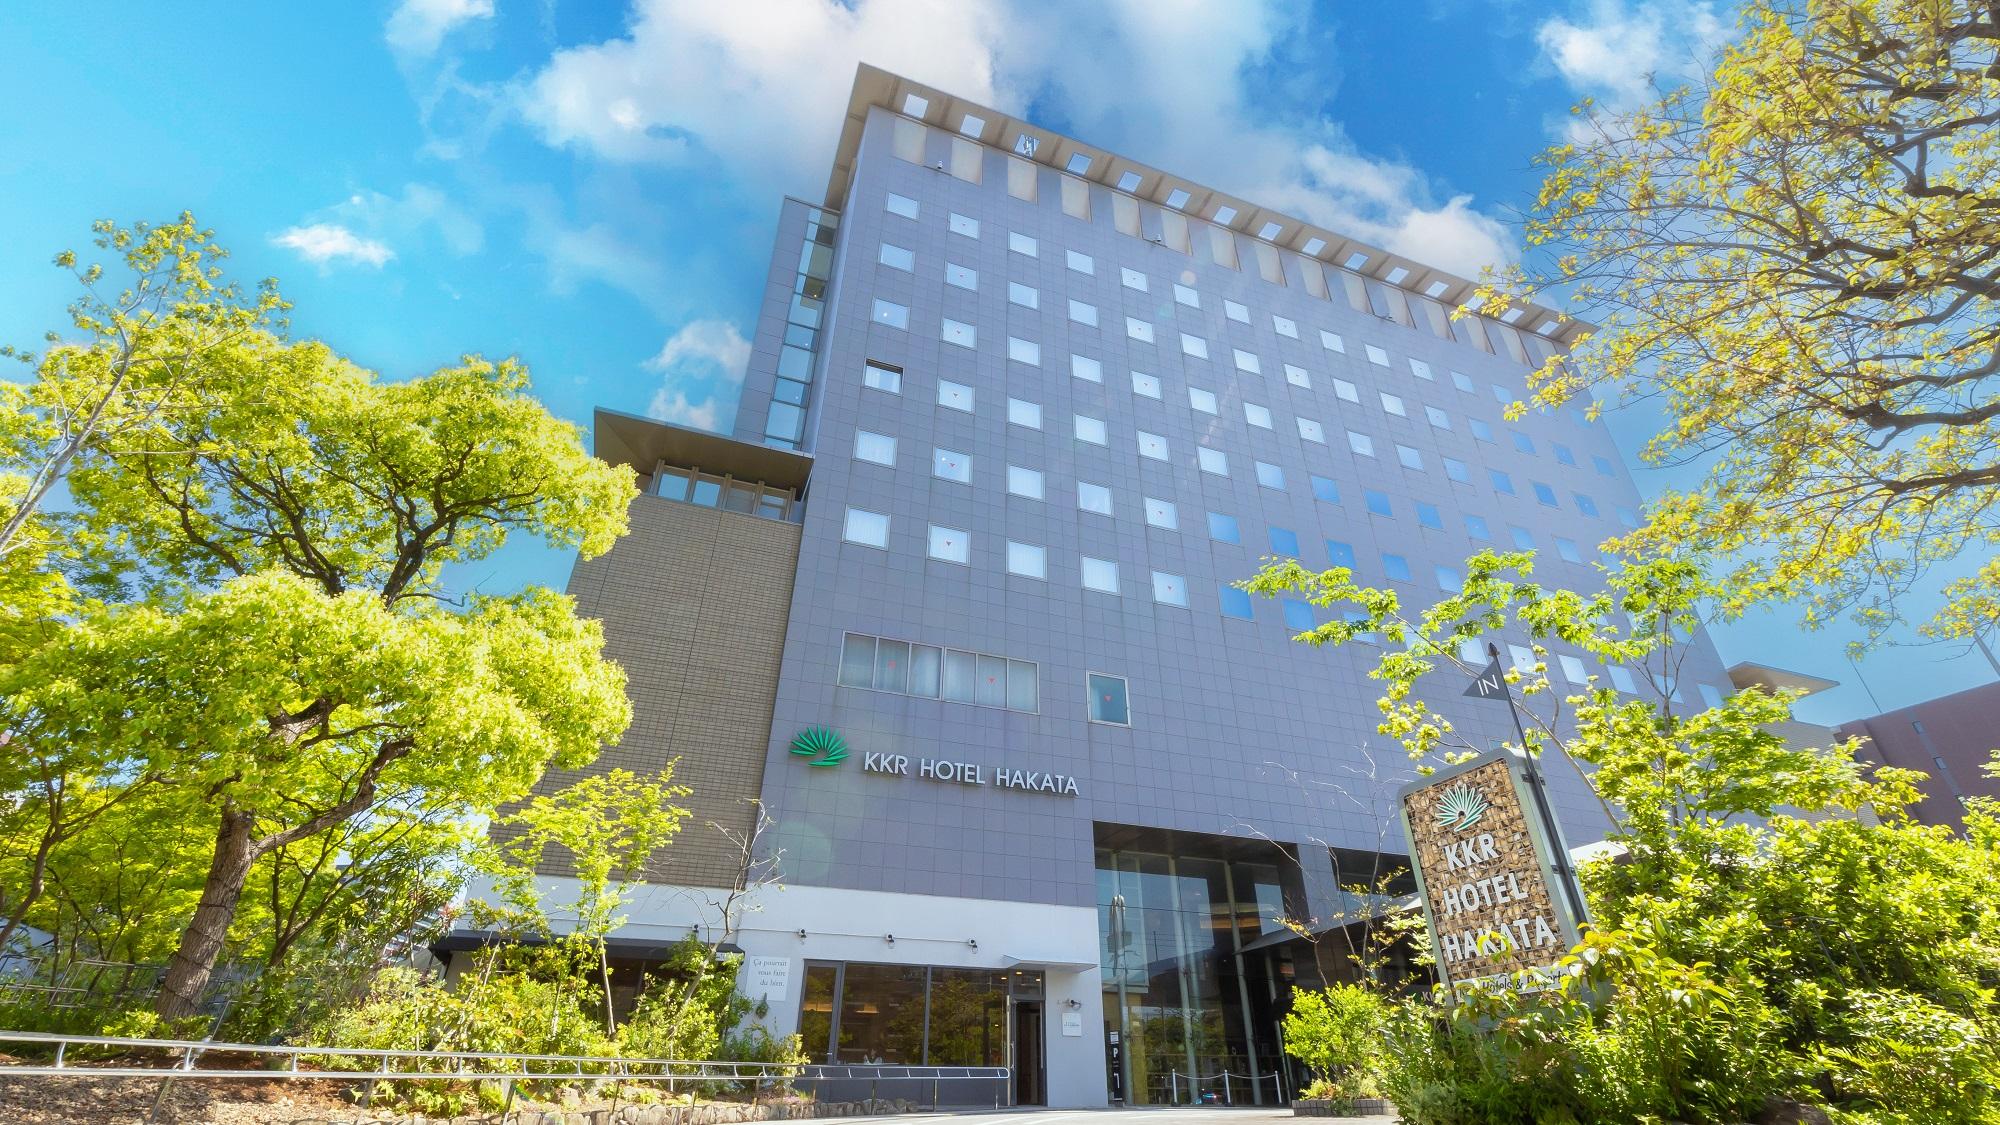 KKRホテル 博多◆楽天トラベル